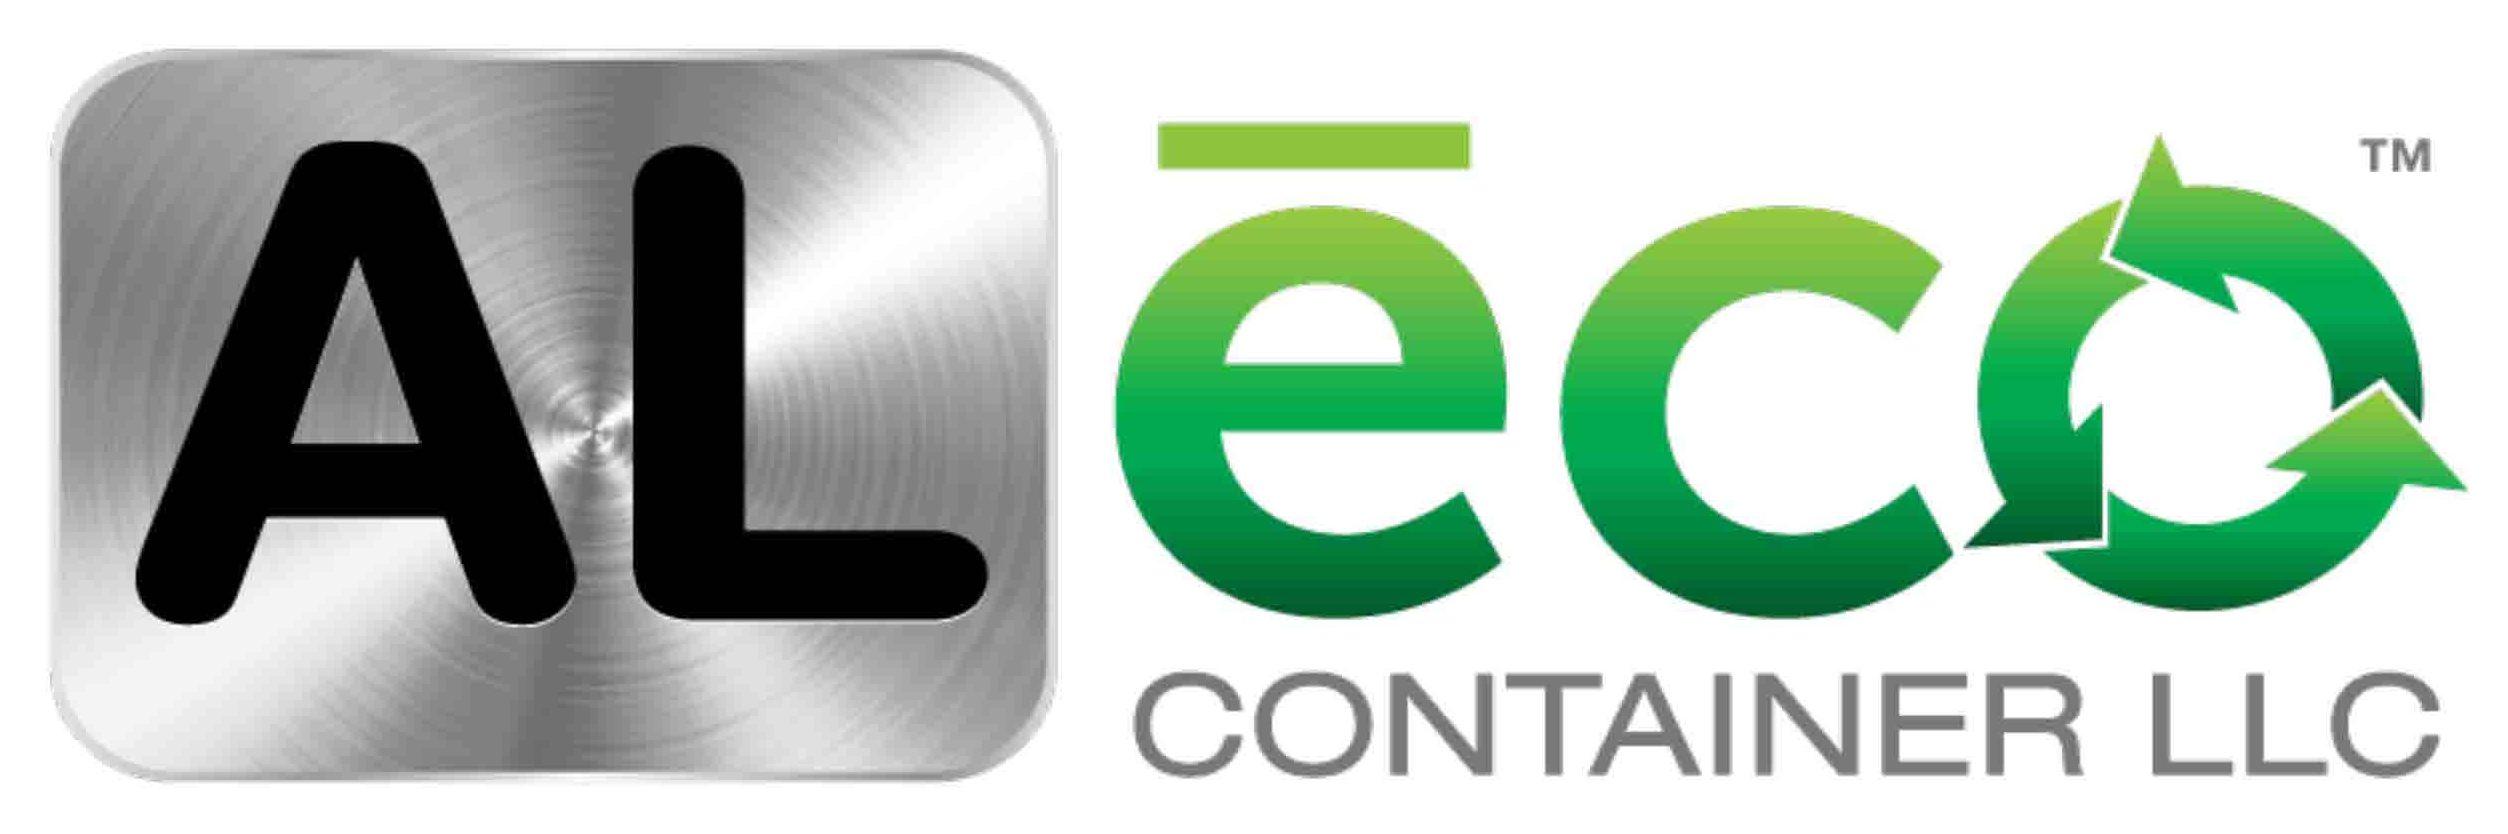 ALeco Container logo